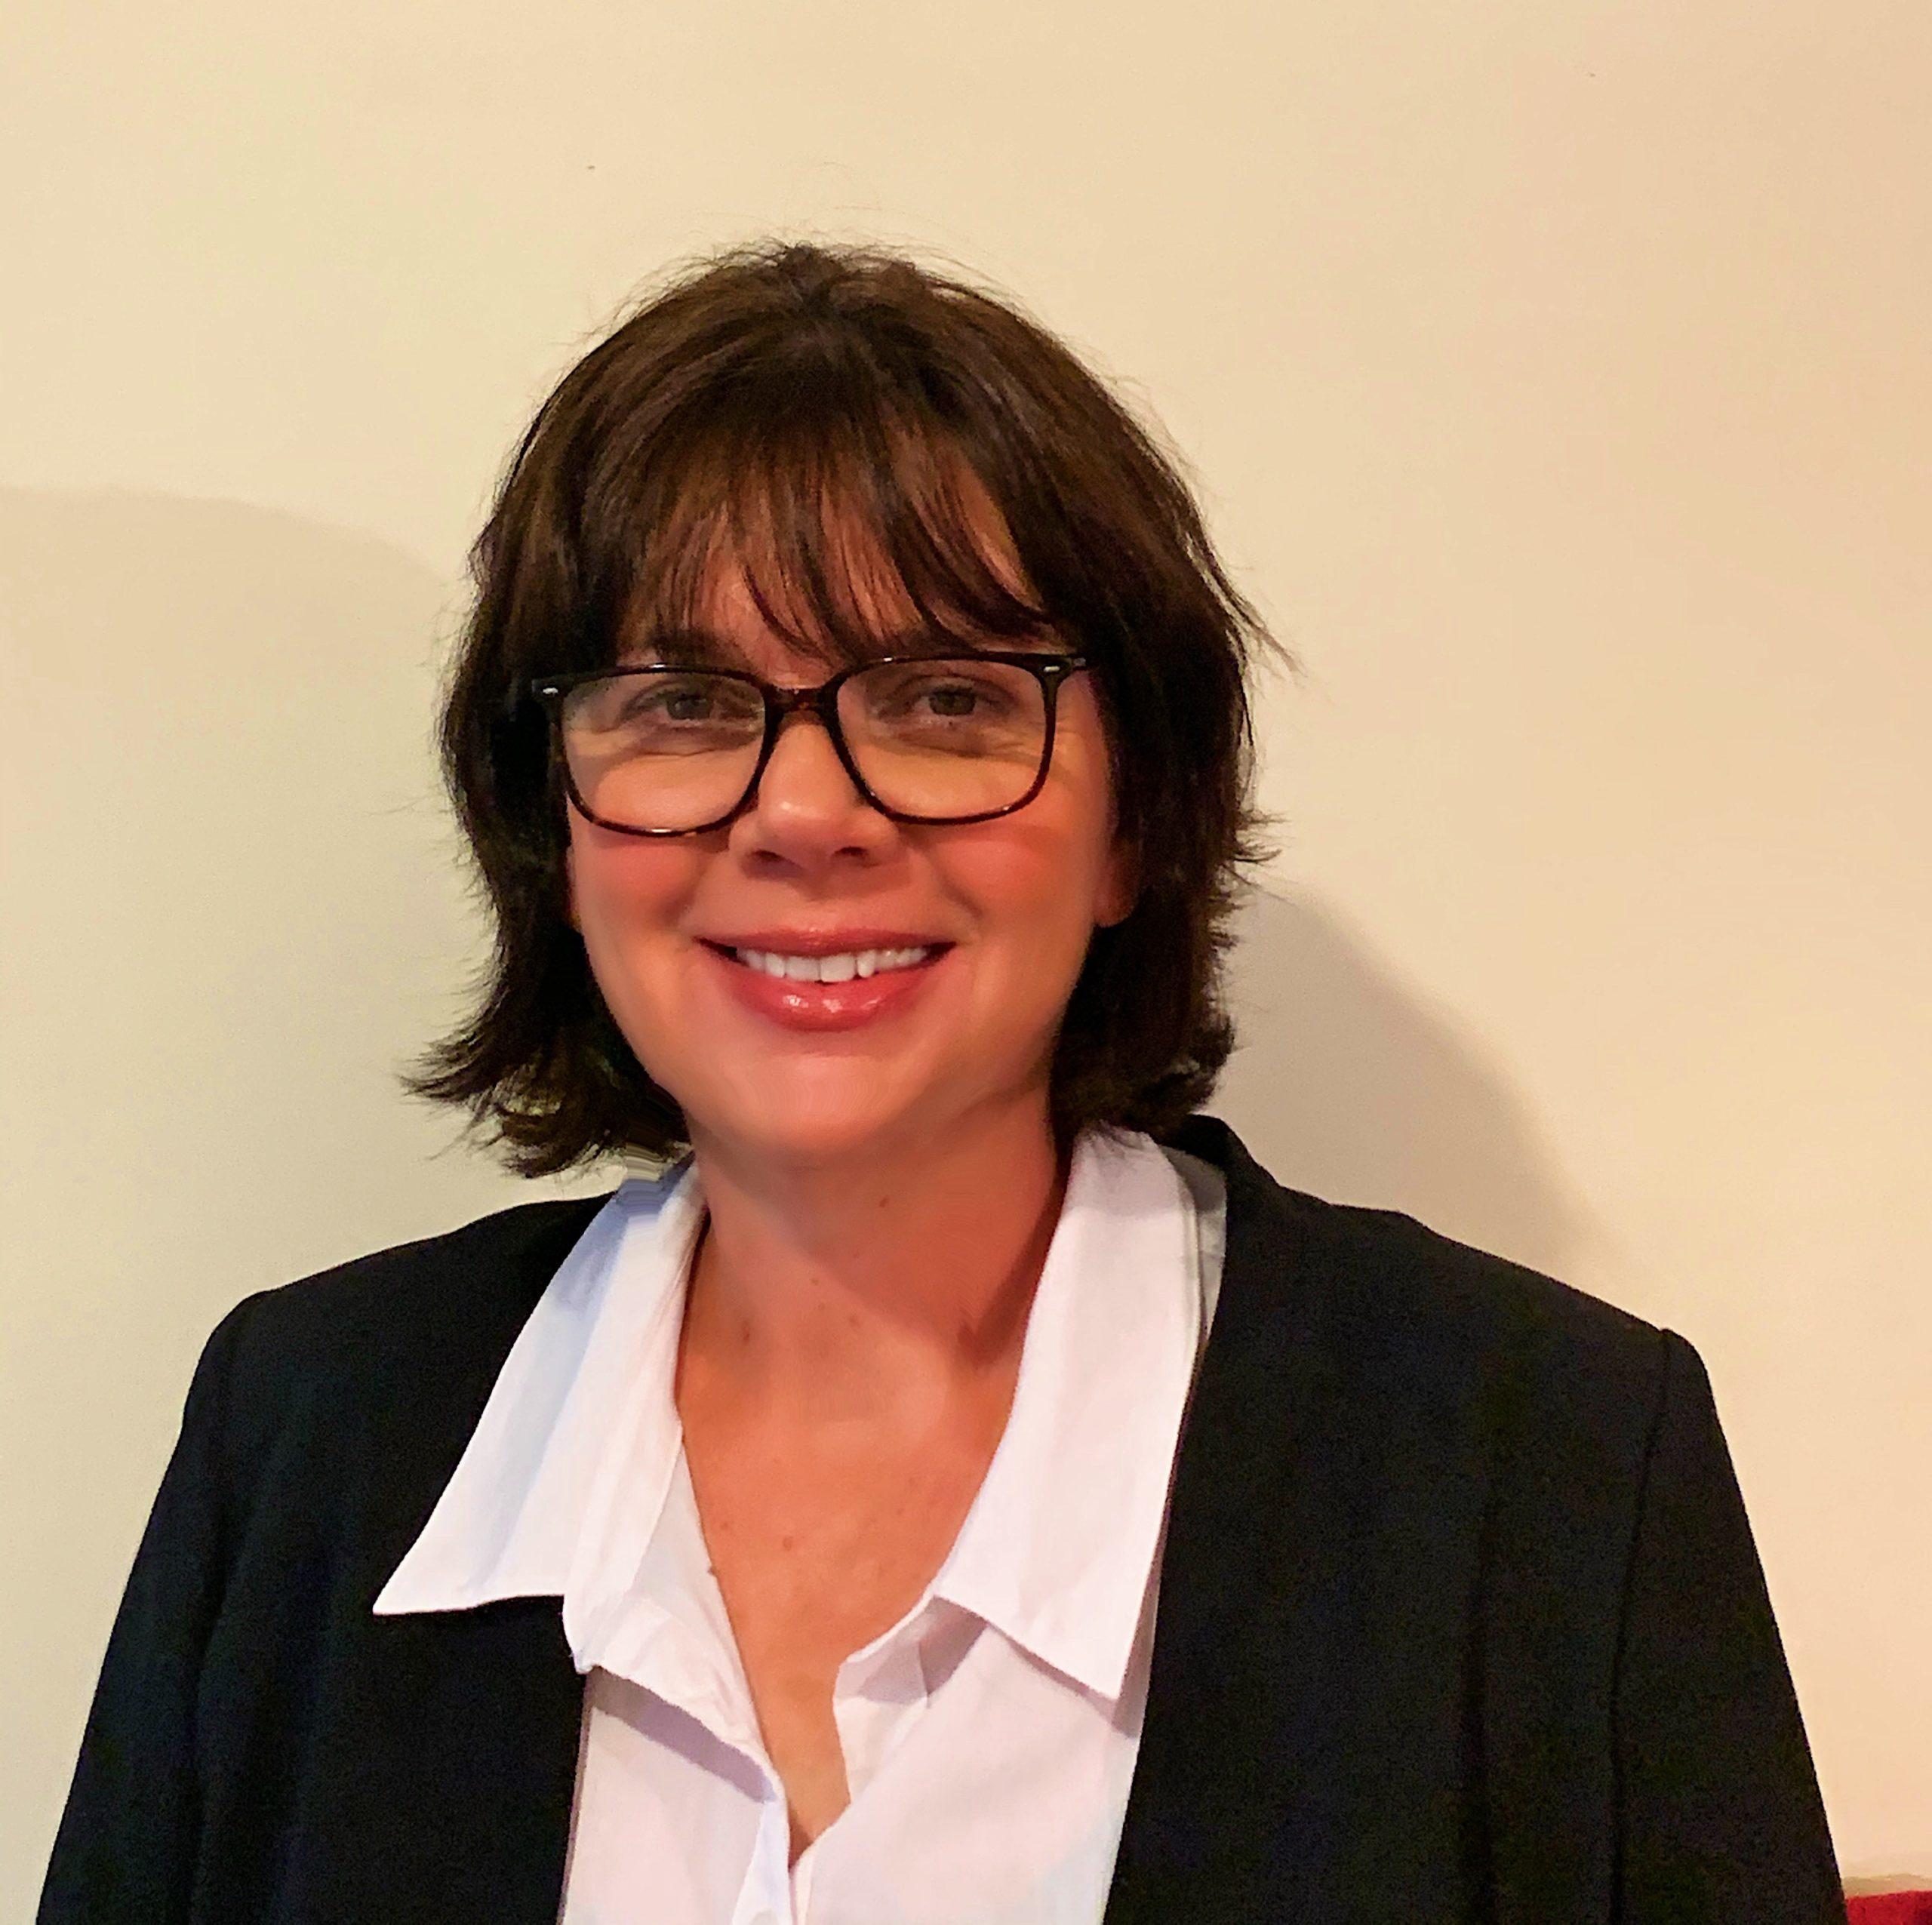 Kathleen Langdon - Director / General Manager